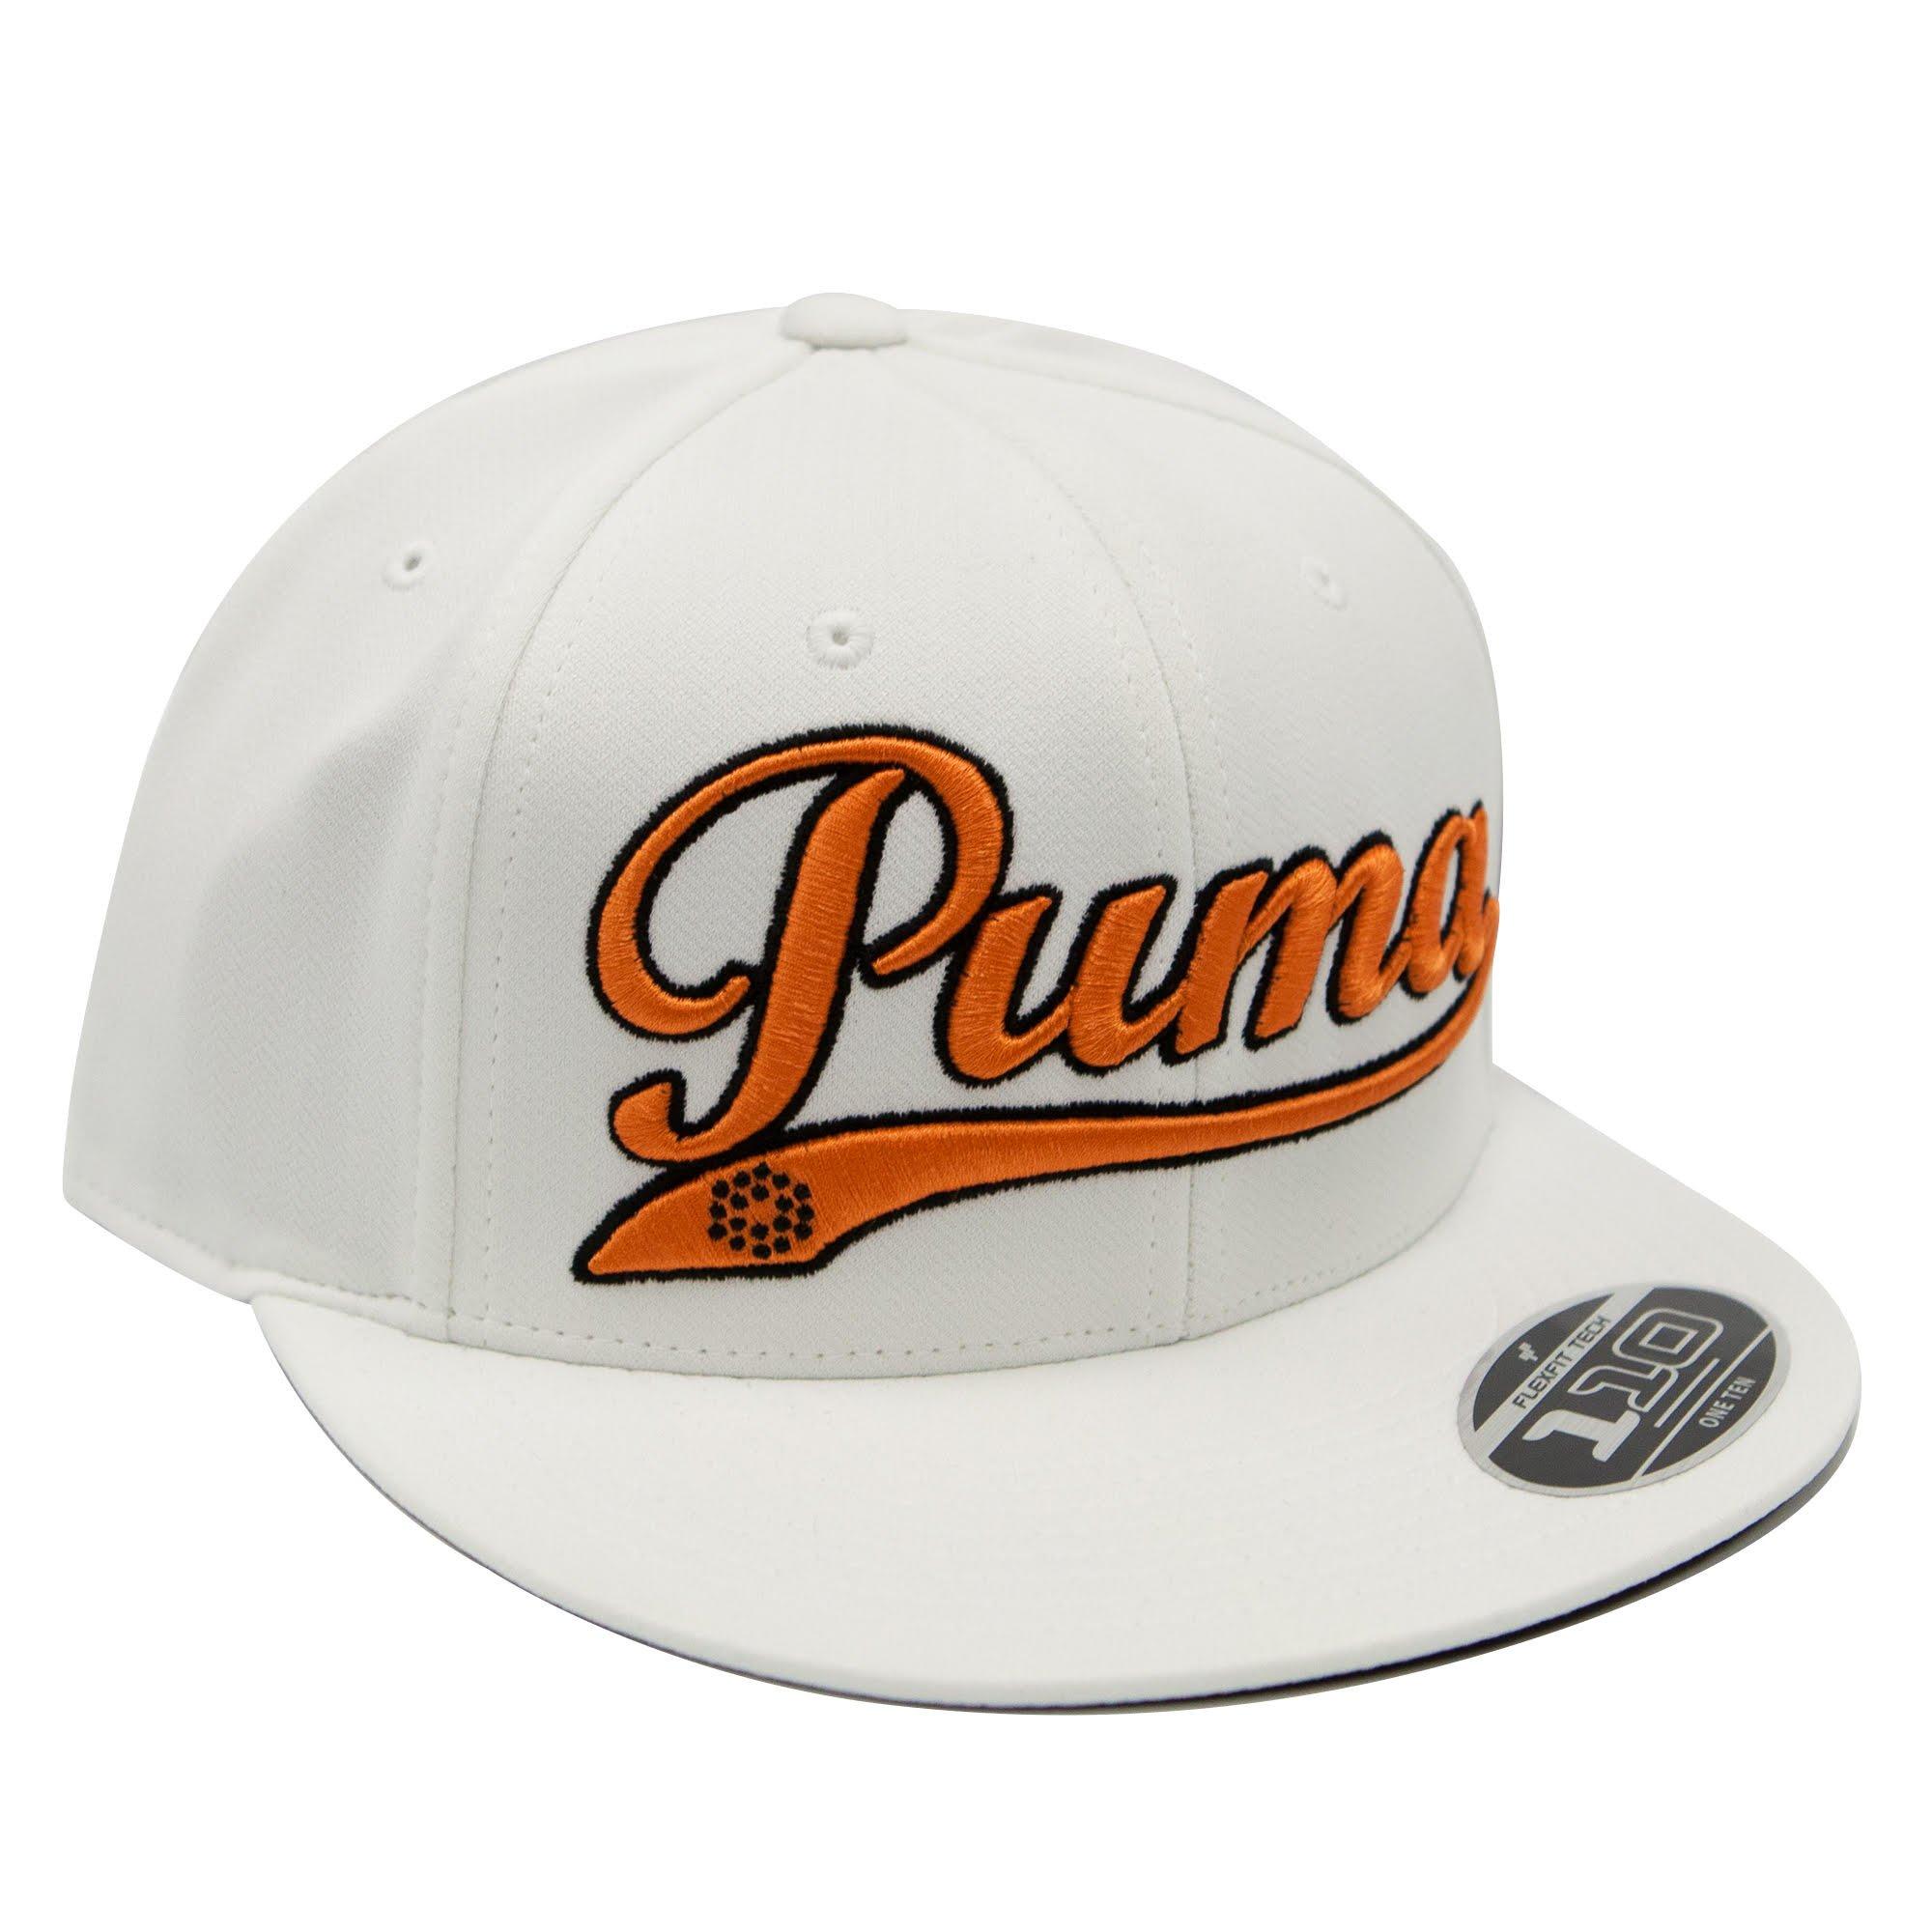 08c75b9ef1d0d Puma Logo Script Cool Cell Snapback Cap - WHITE - PMGO2117-WHT ...